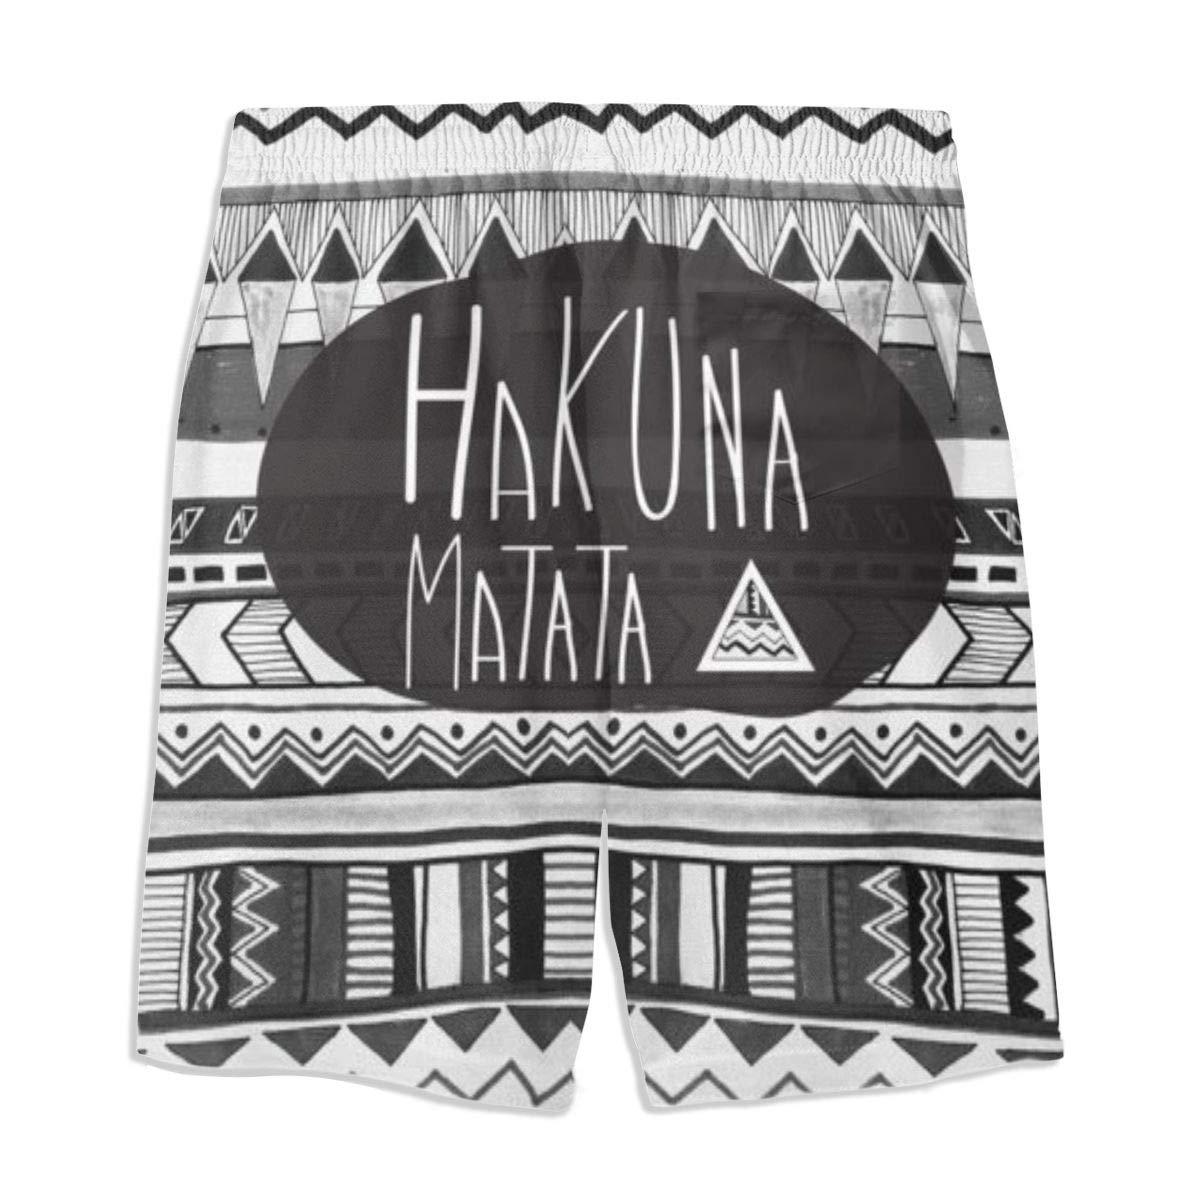 Meiya-Design Pantaloncini da Spiaggia con Tasca Costume da Bagno da Uomo Hakuna Matata